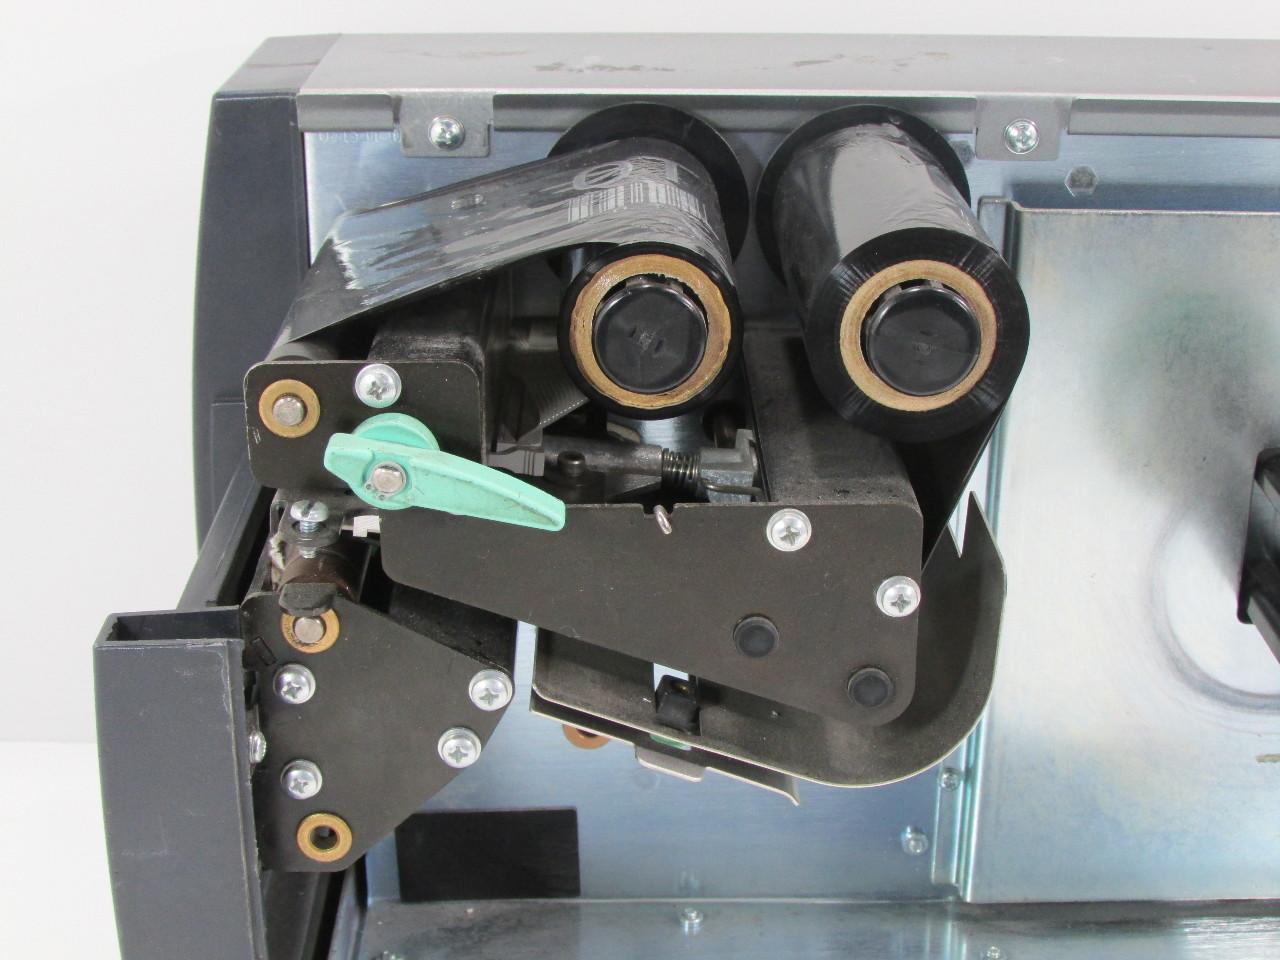 INTERMEC EASY CODER 3400e THERMAL LABEL PRINTER - PARTS | eBay